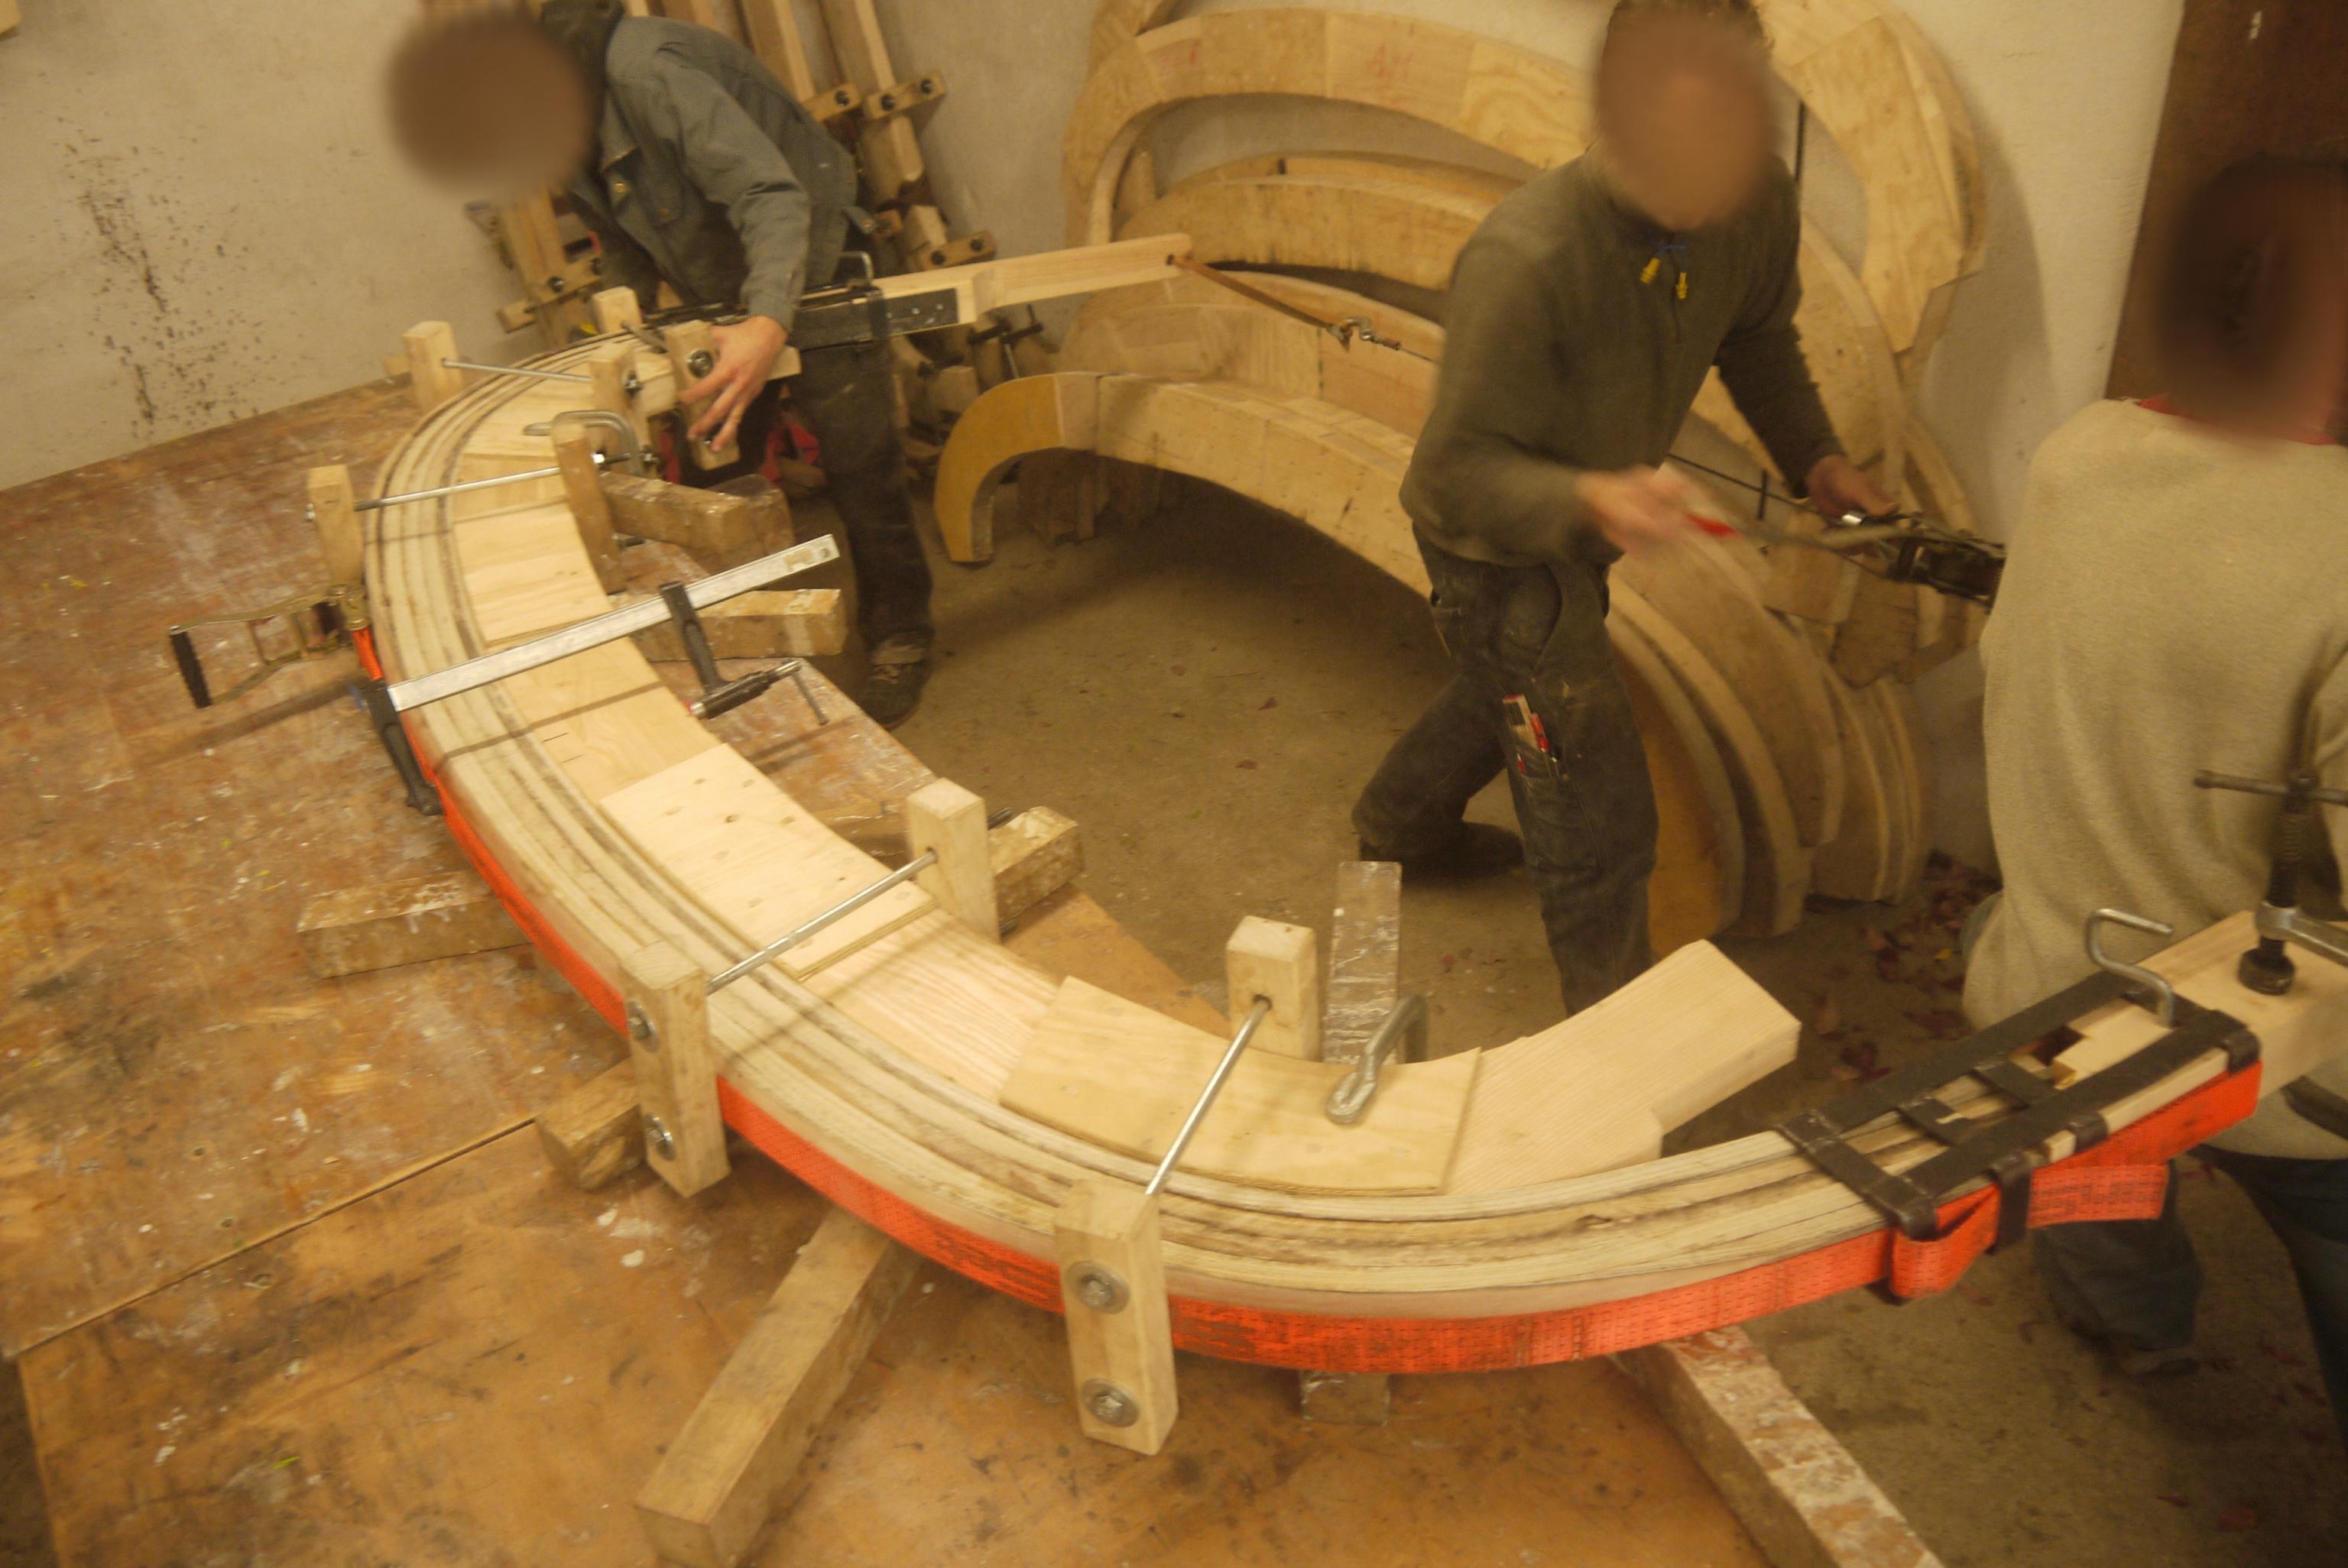 Biegen der Dachbögen, Danke an das Holzlabor in Thalheim